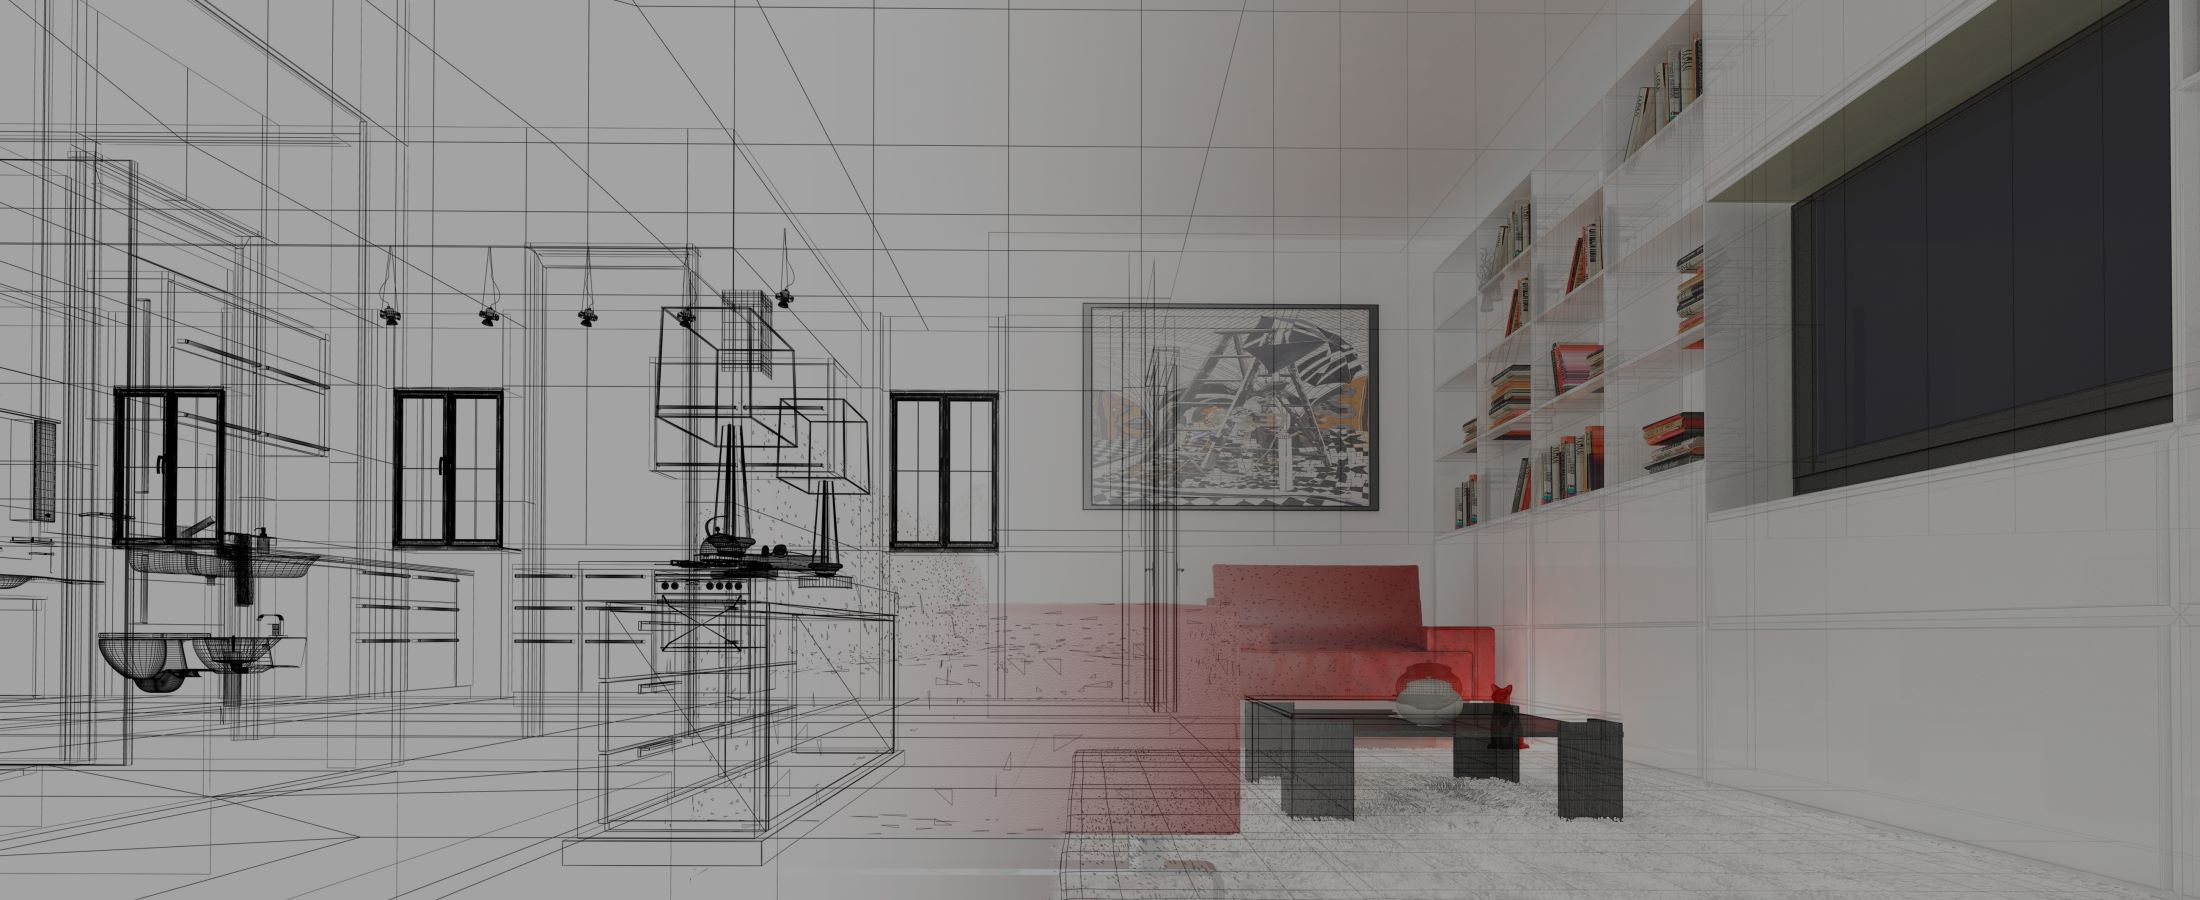 Radiateur Salle De Bain Mixte ~ vamaya construction entrepreneur sp cialis en r novation